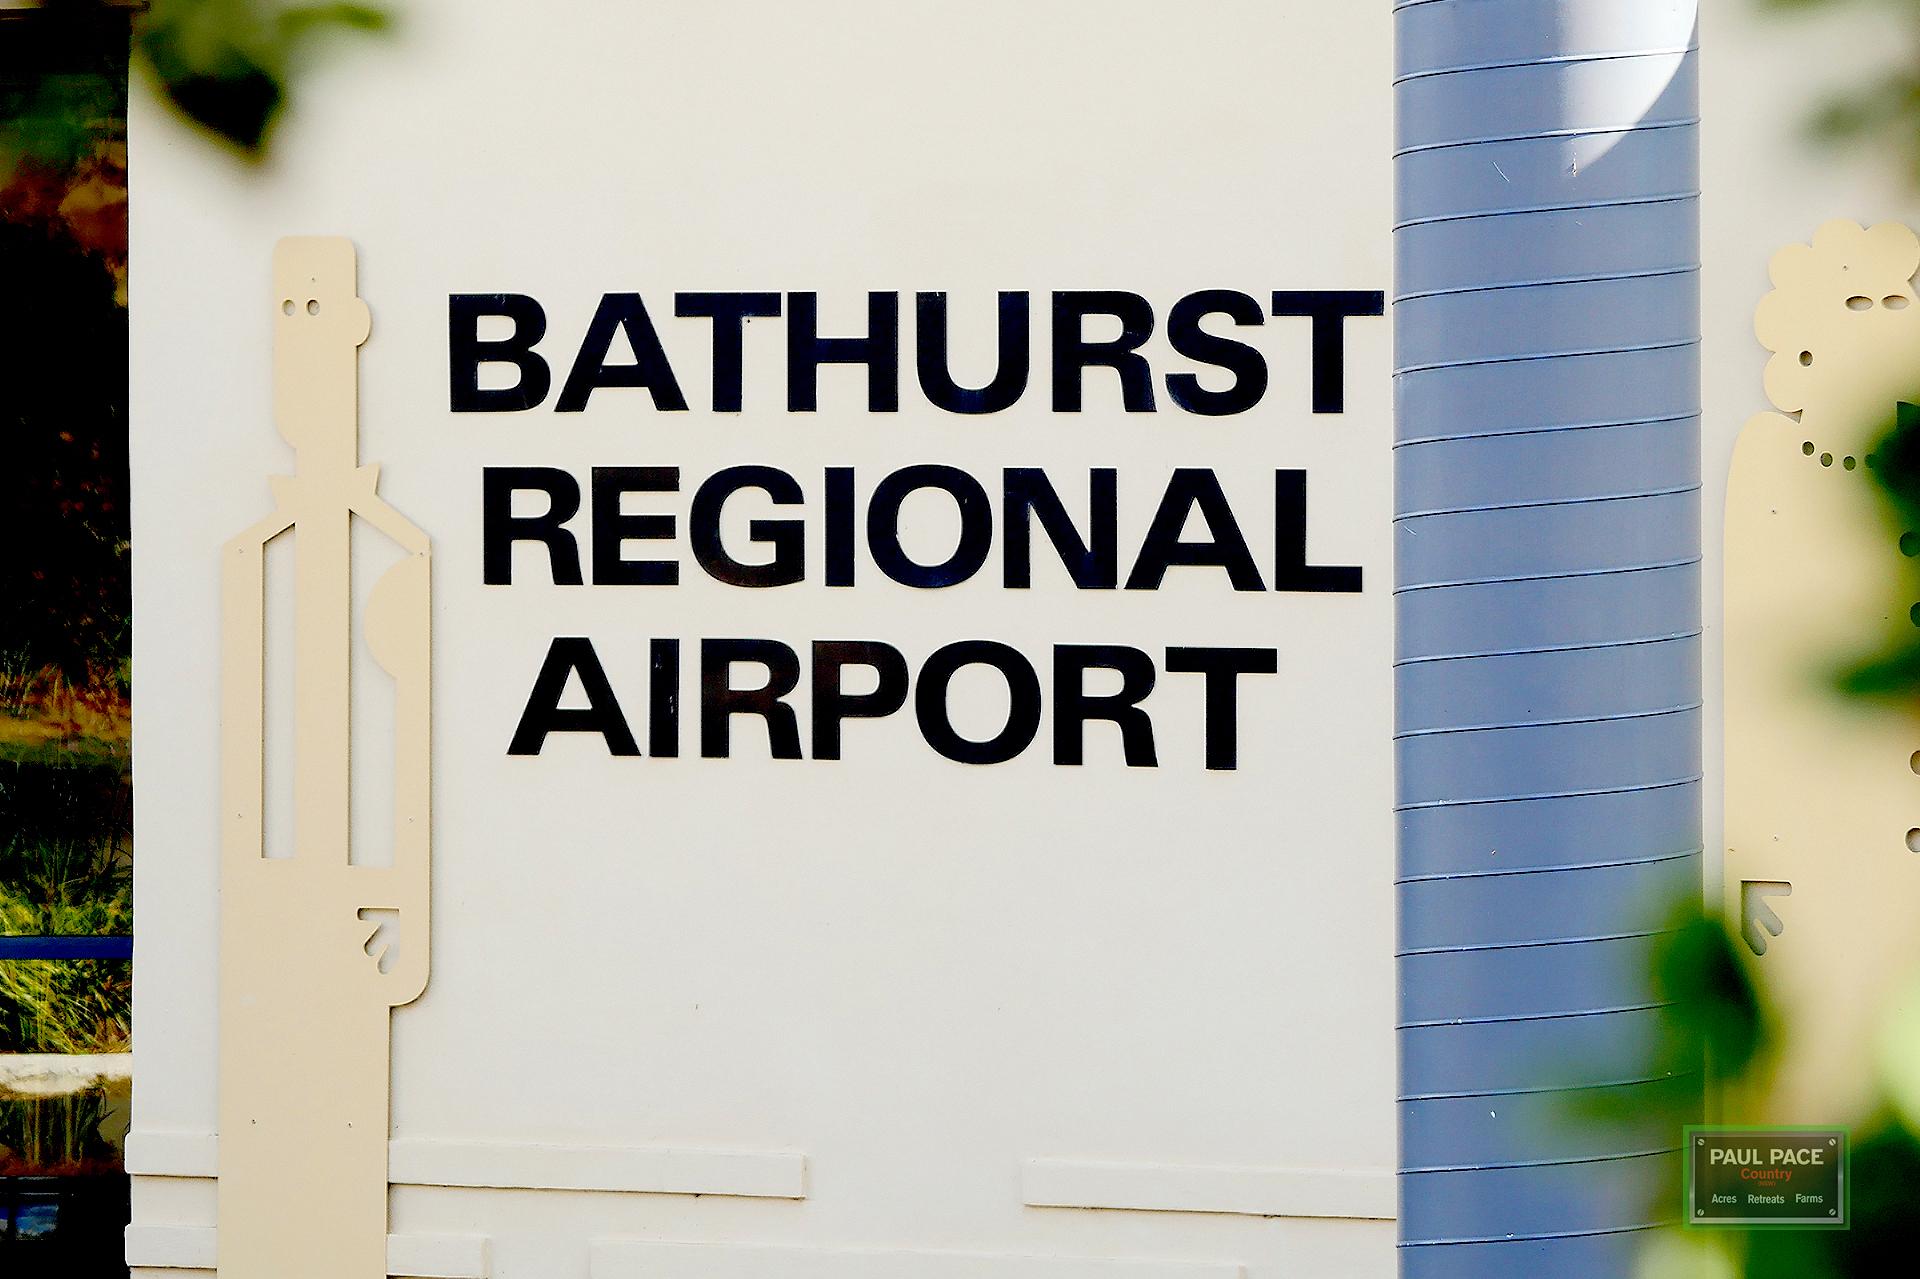 61 Sydney Road, Bathurst